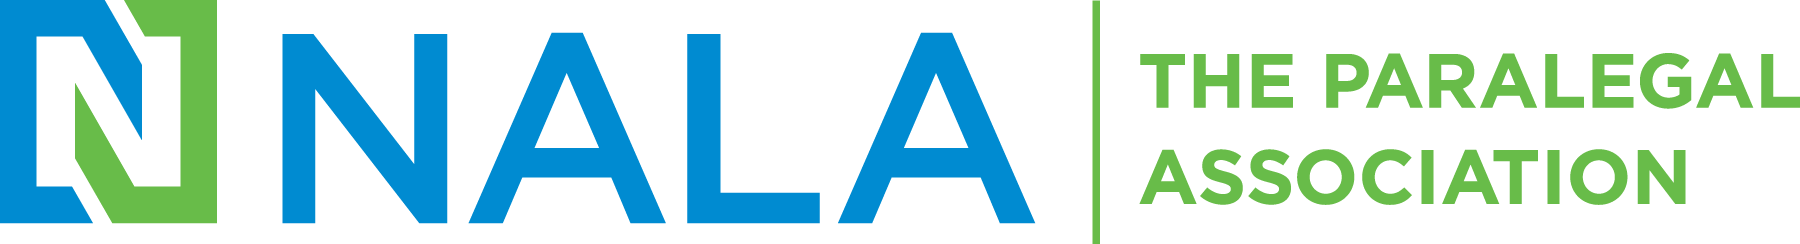 NALA_logo_1